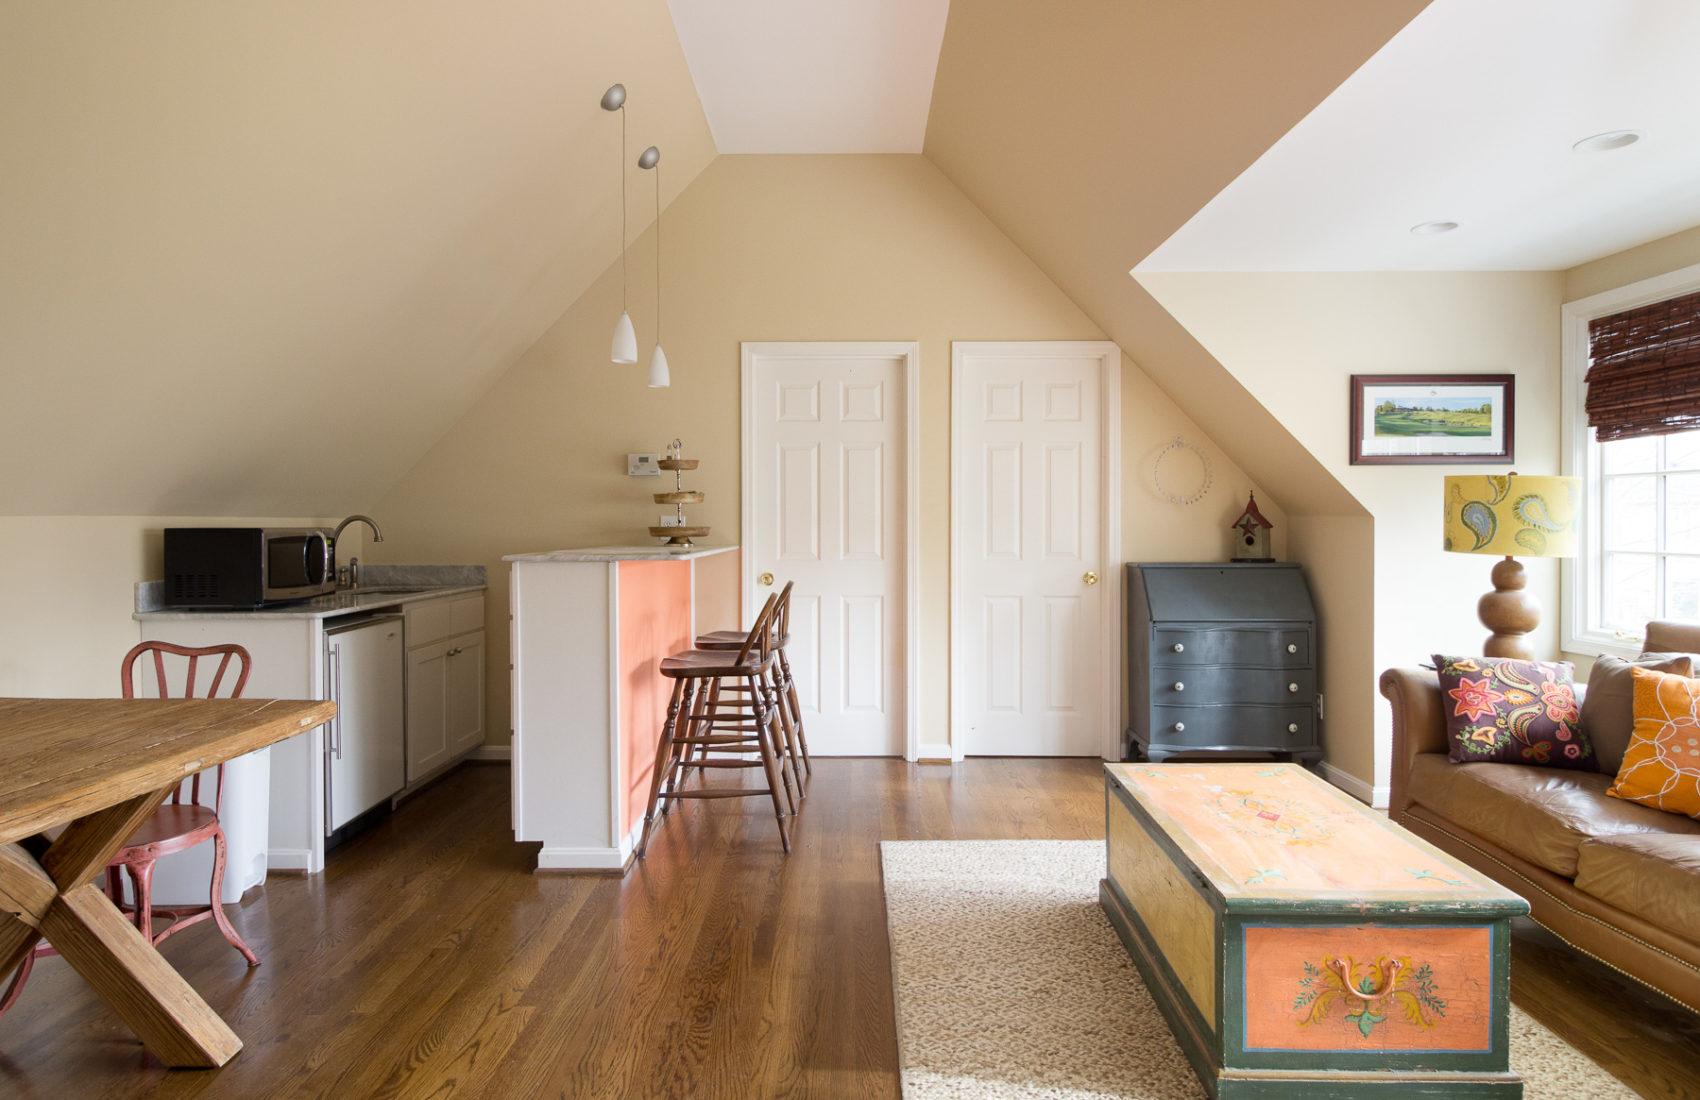 Interior and Architectural Photography Portfolio